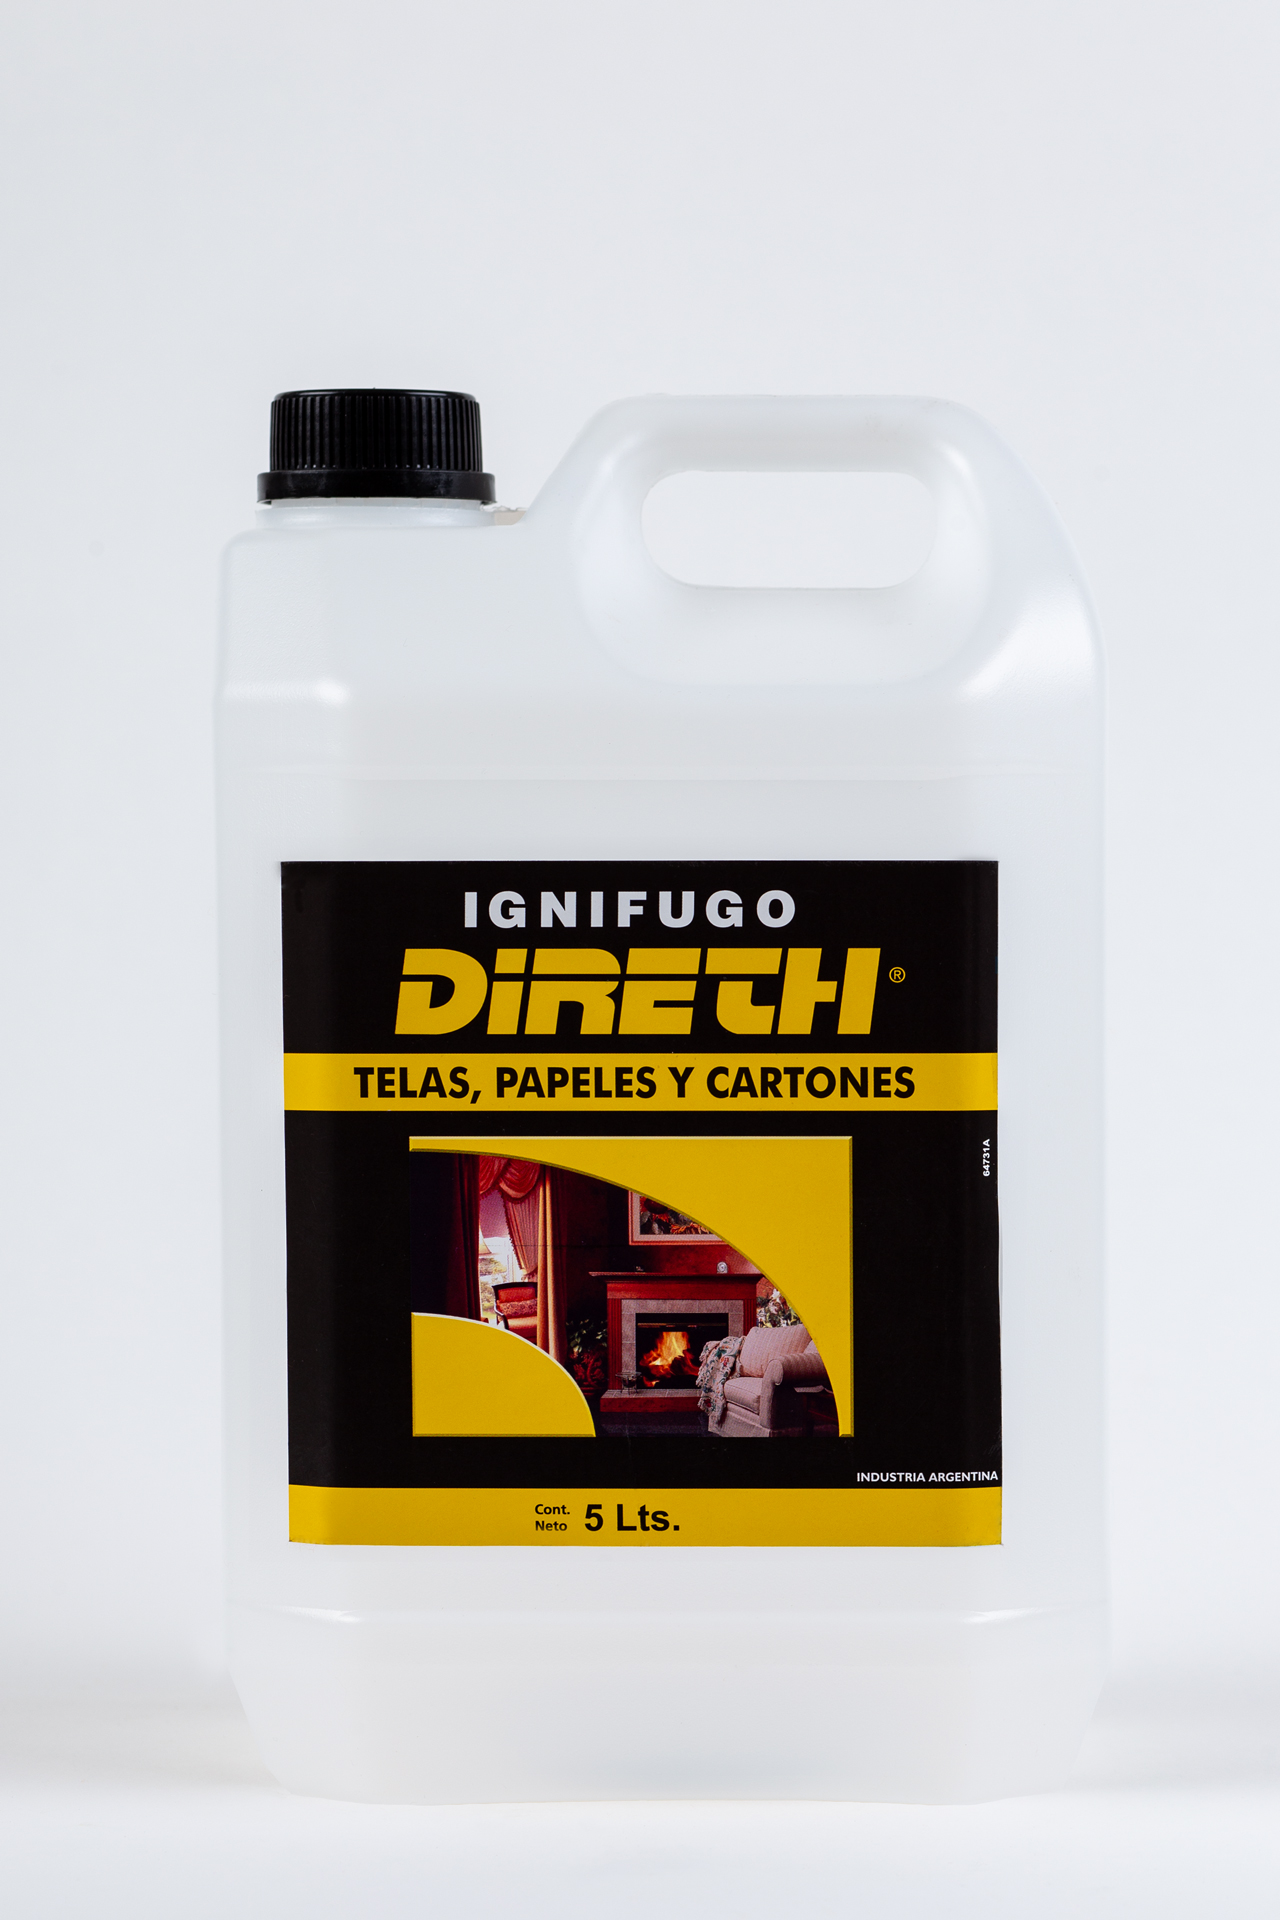 Ignífugo para Telas, Papeles y Cartones